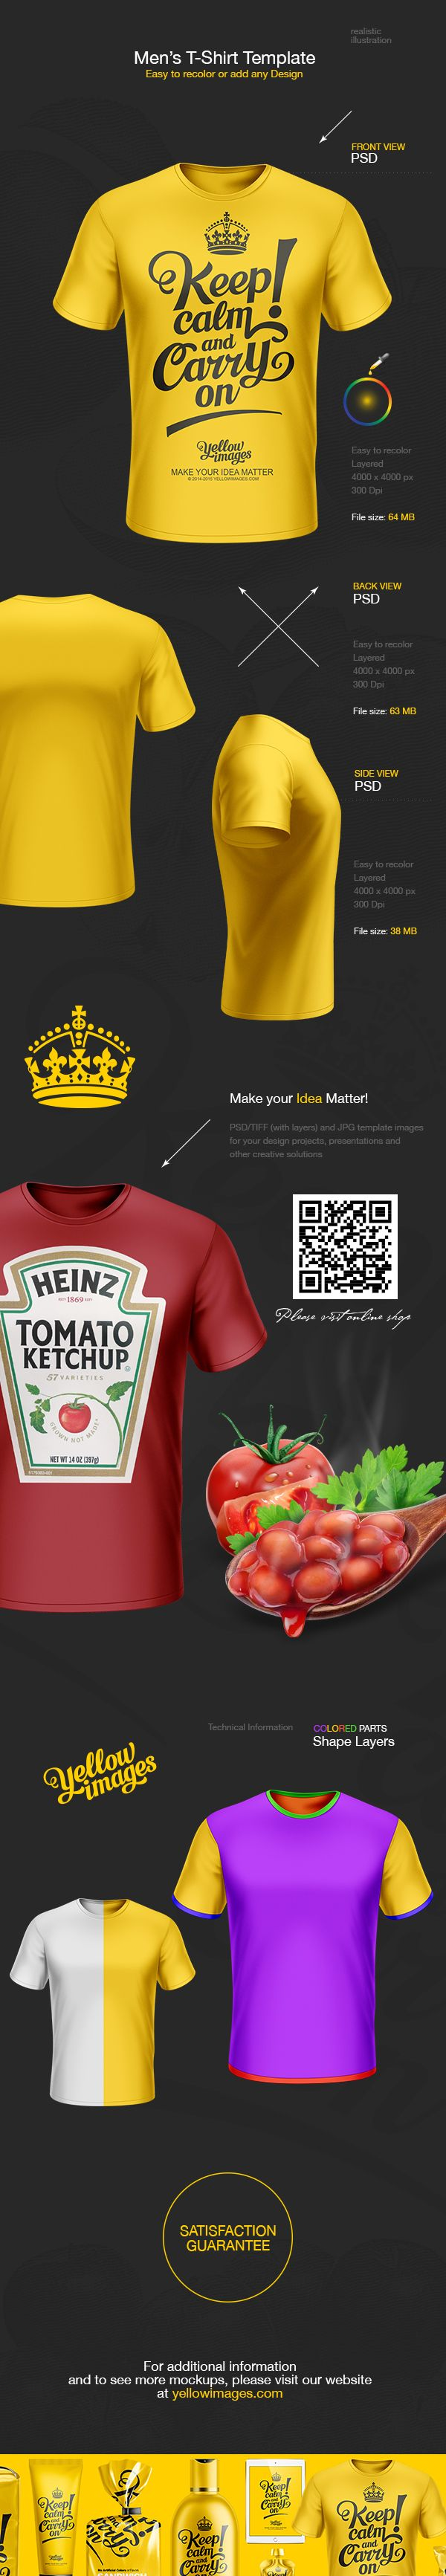 Scalable t shirt mockups more info - Men S T Shirt Template On Behance